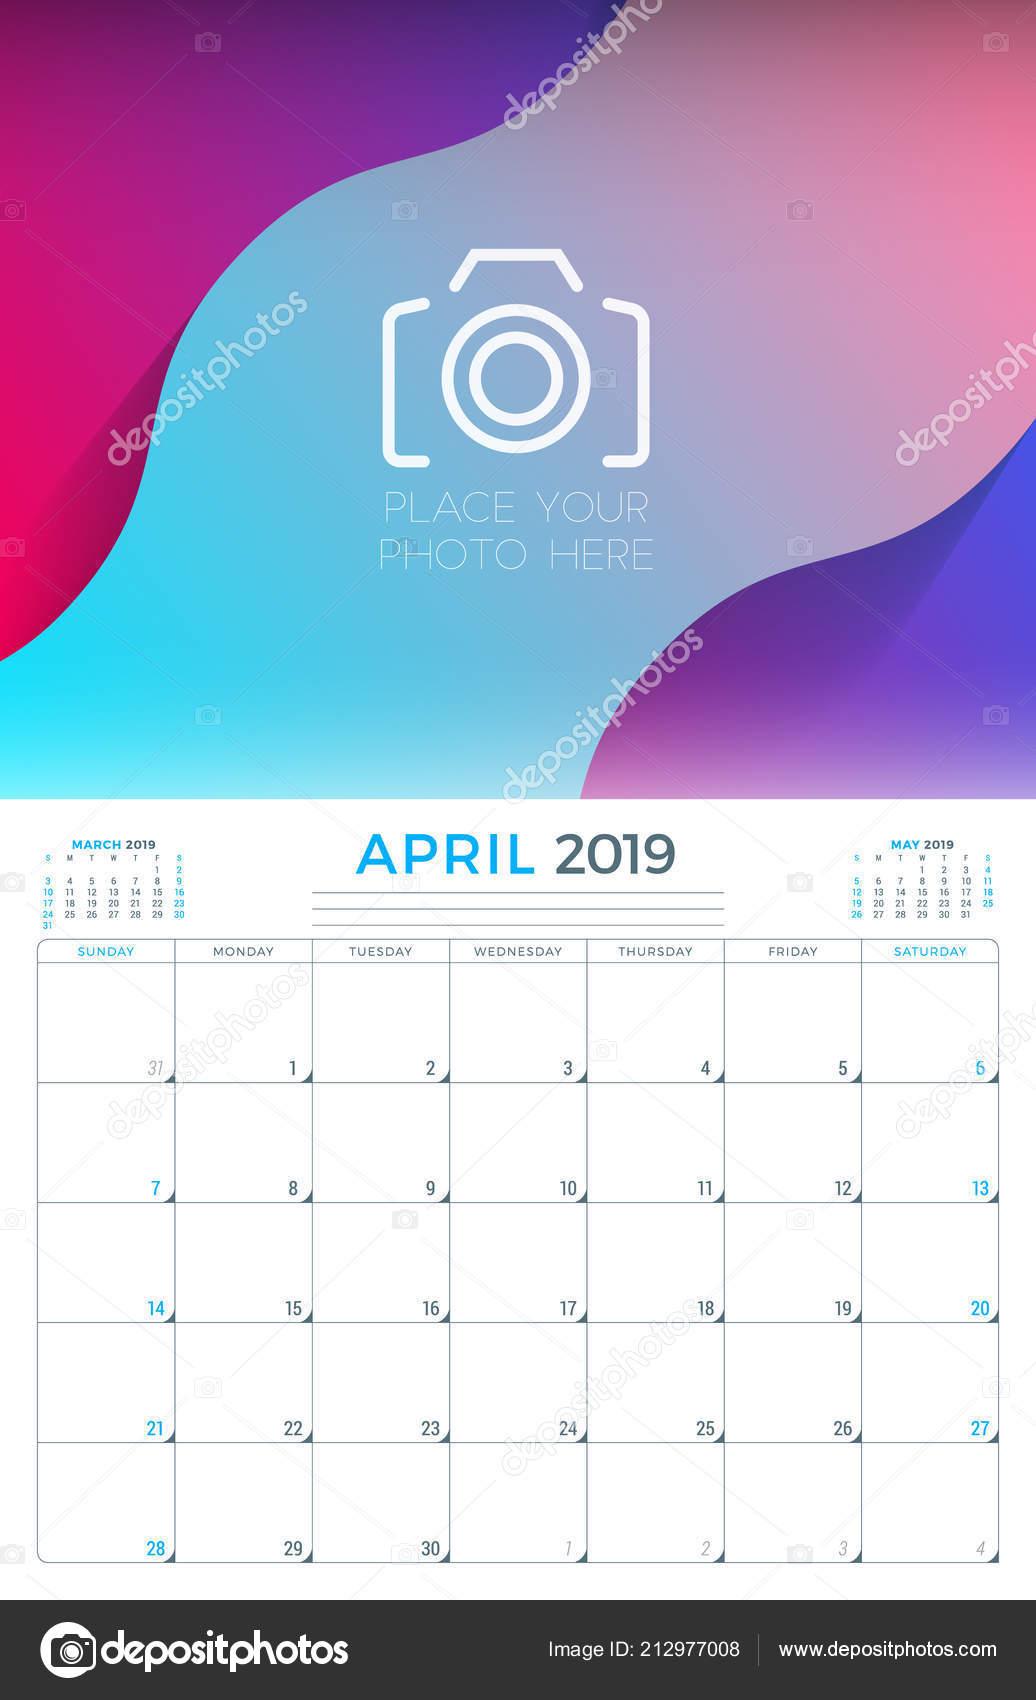 April 2019 Calendar Planner Stationery Design Template Place Photo